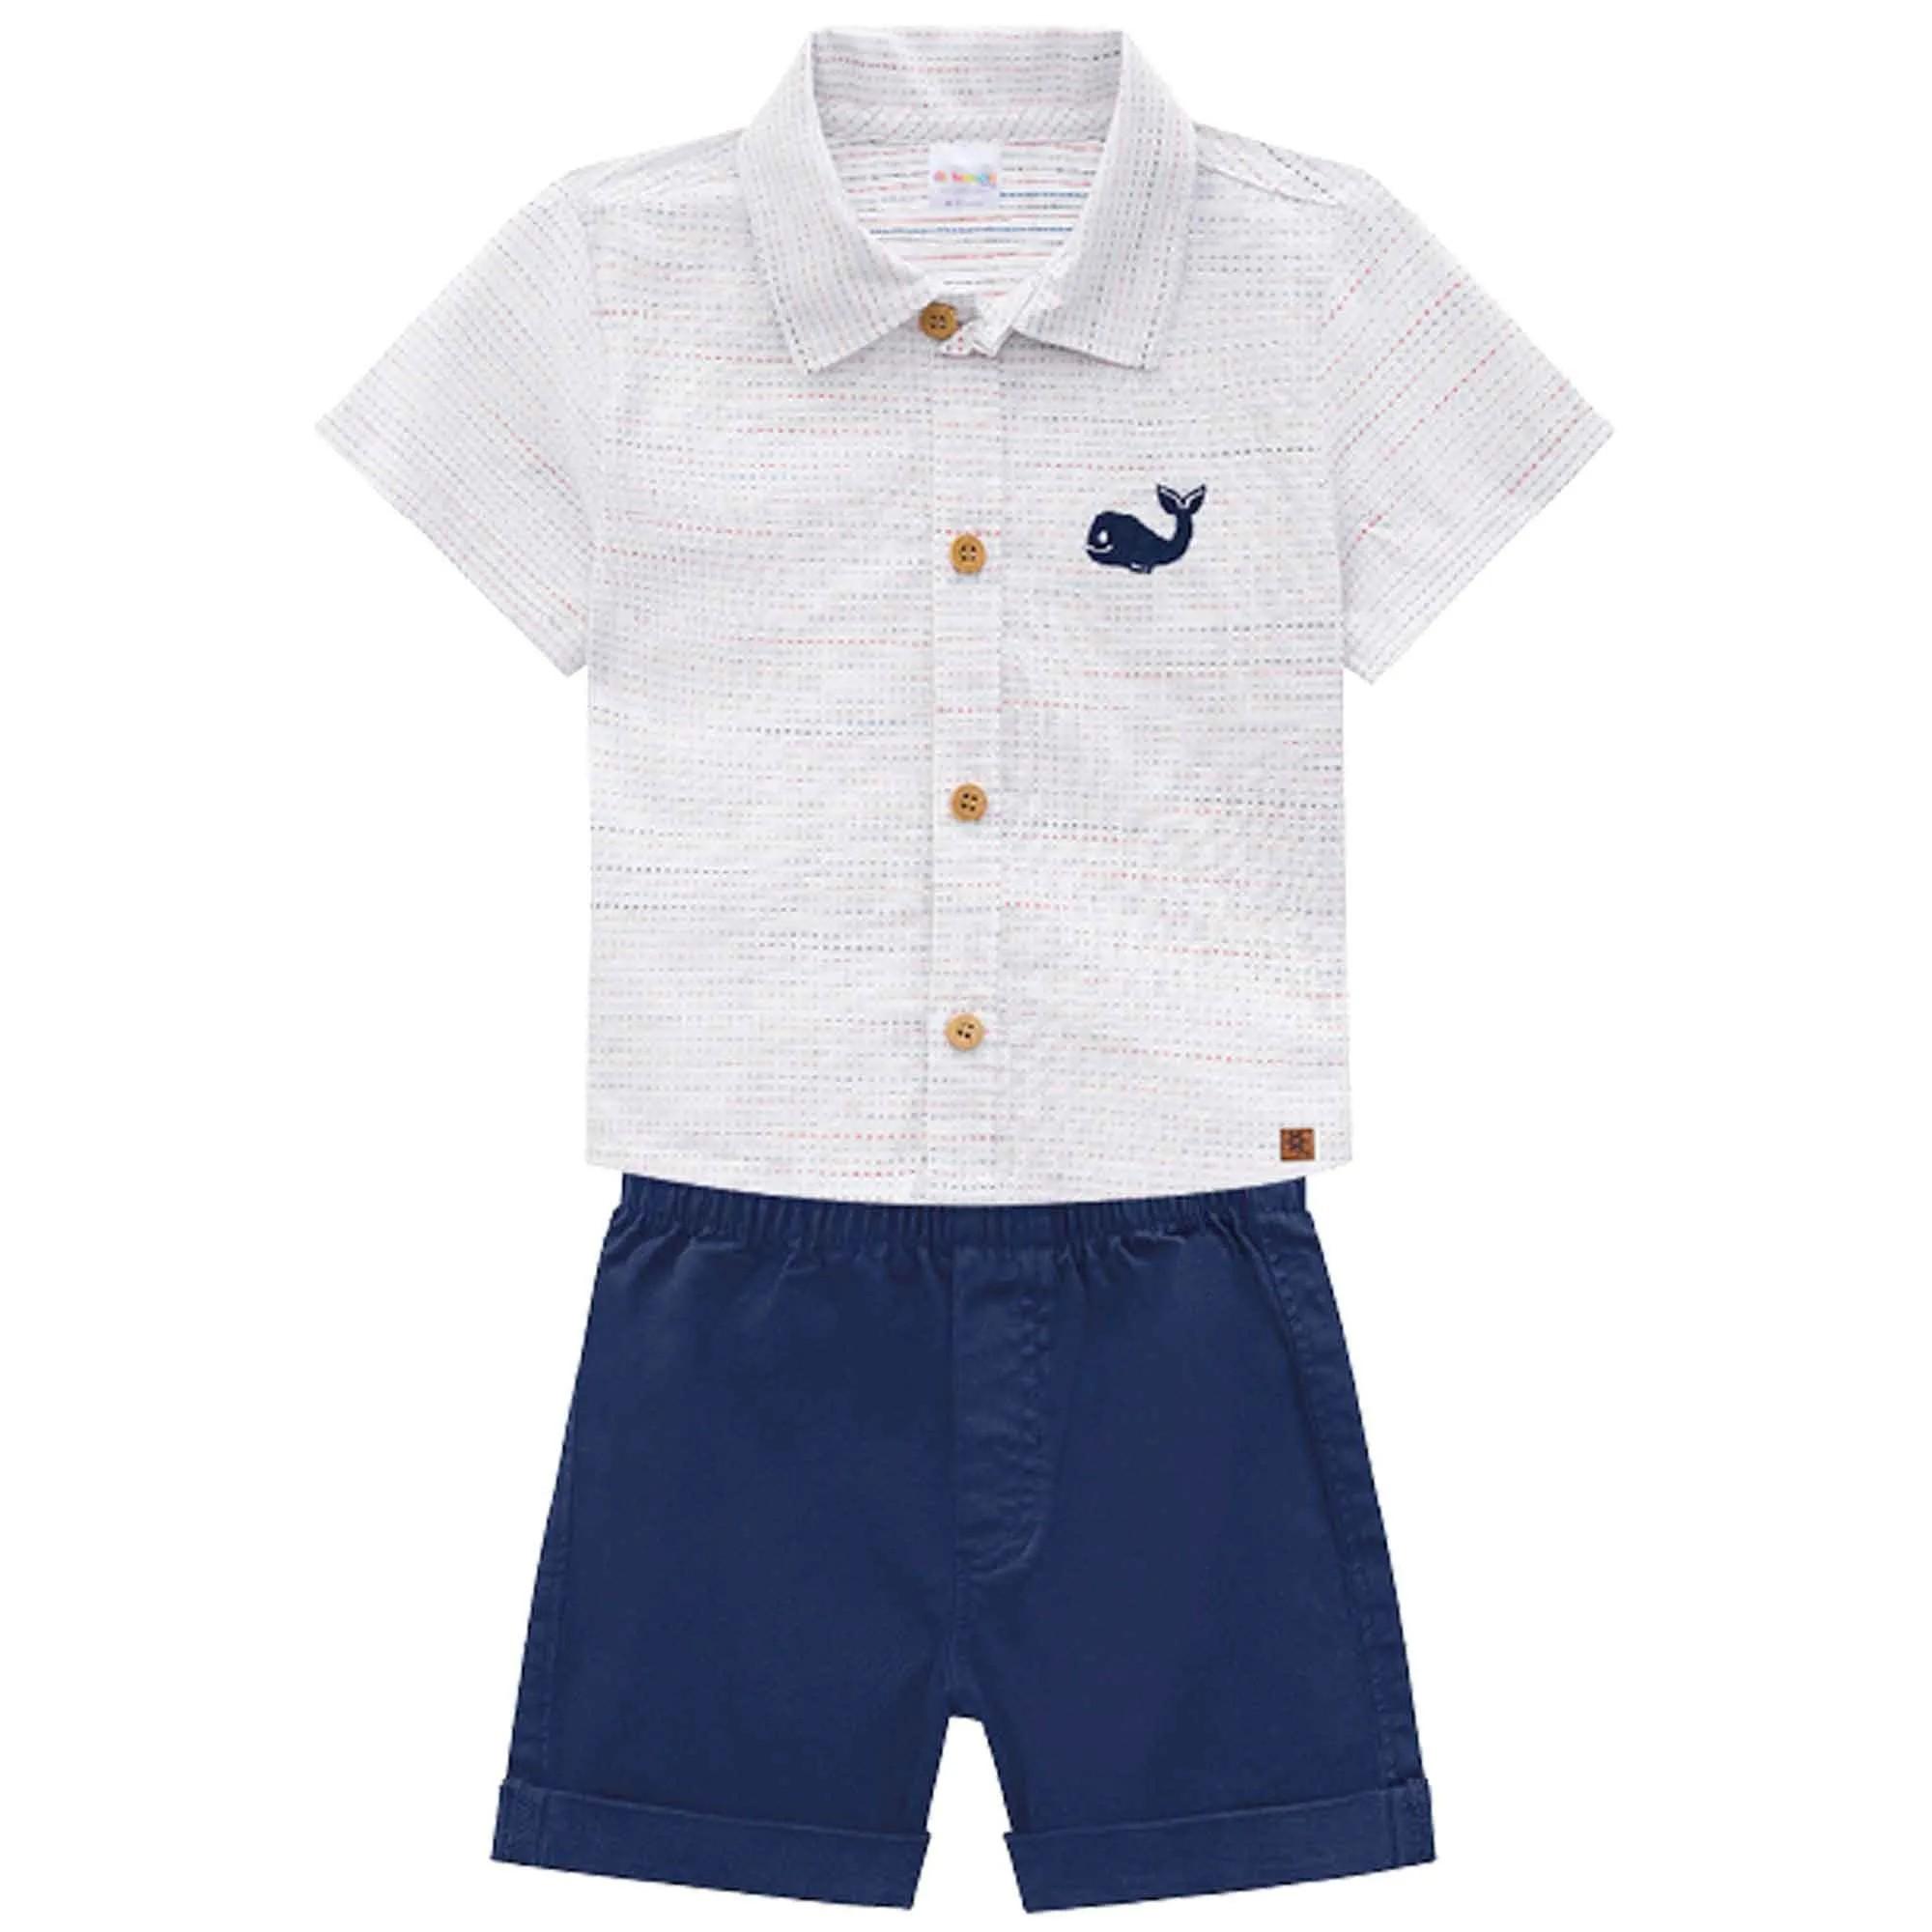 Conjunto Verão Brandili Baby Camisa Bordada com Bermuda Sarja  - P ao G